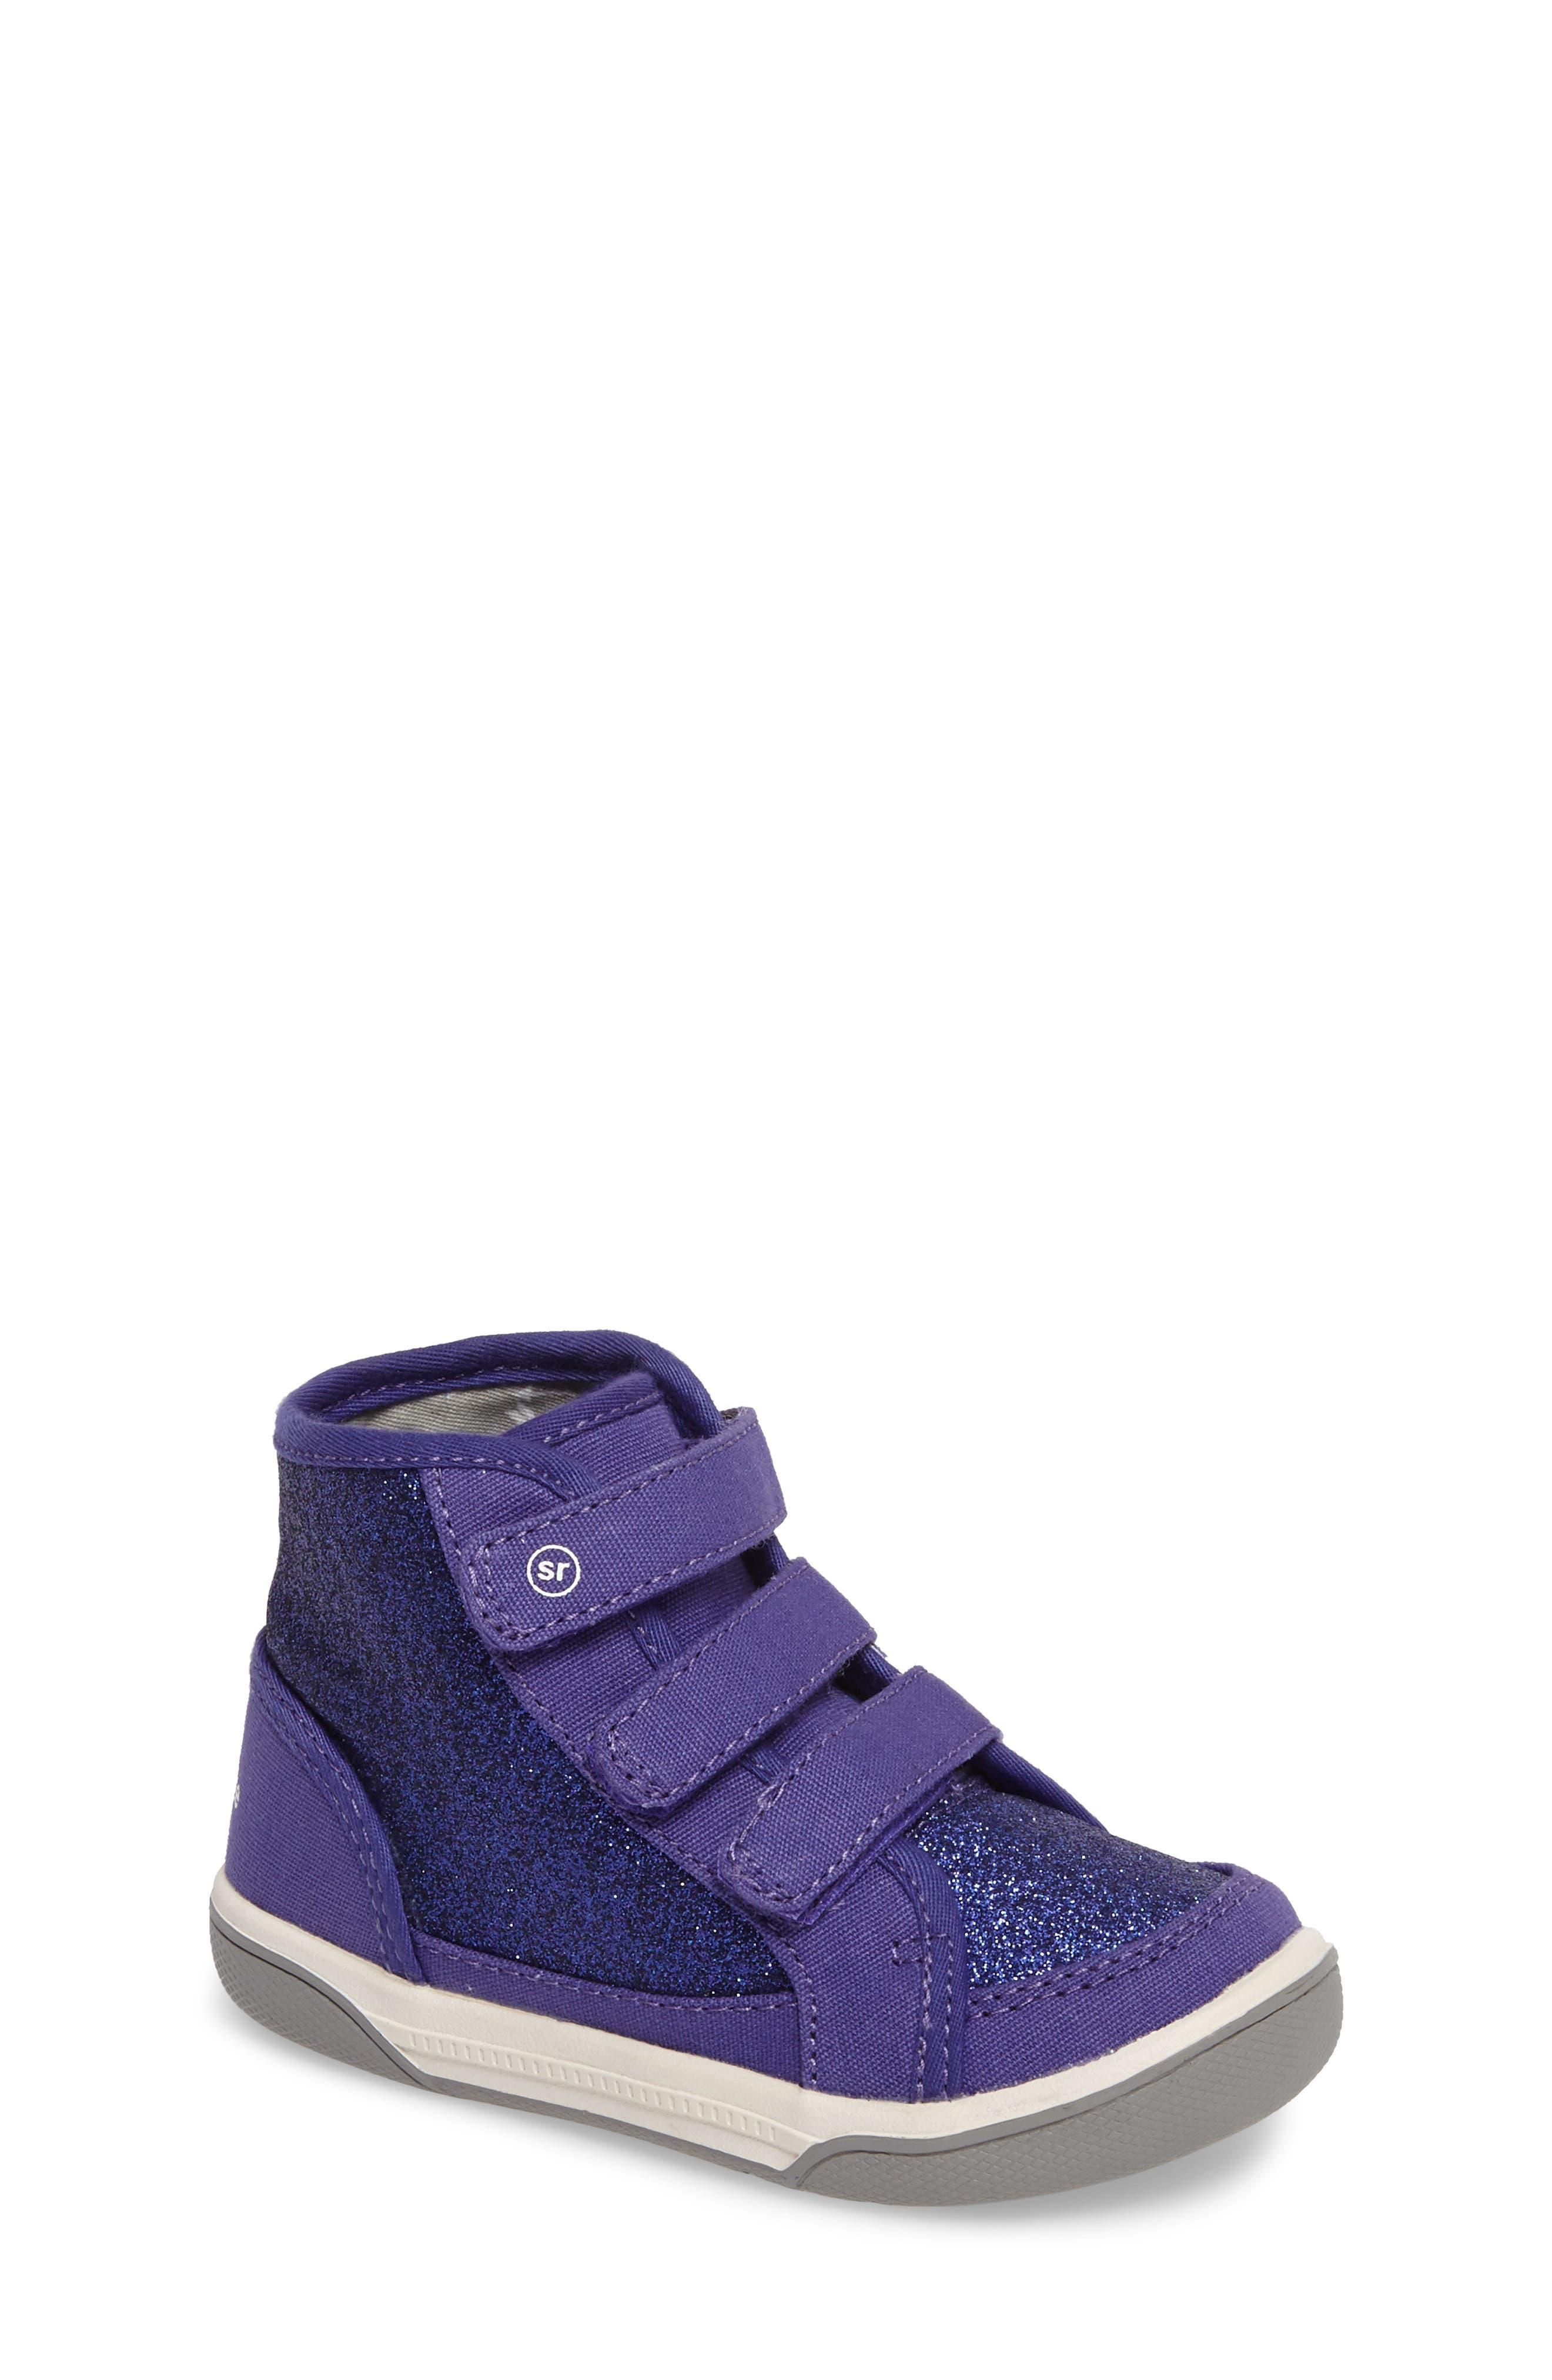 Stride Rite Ellis Glitter High Top Sneaker (Baby, Walker & Toddler)